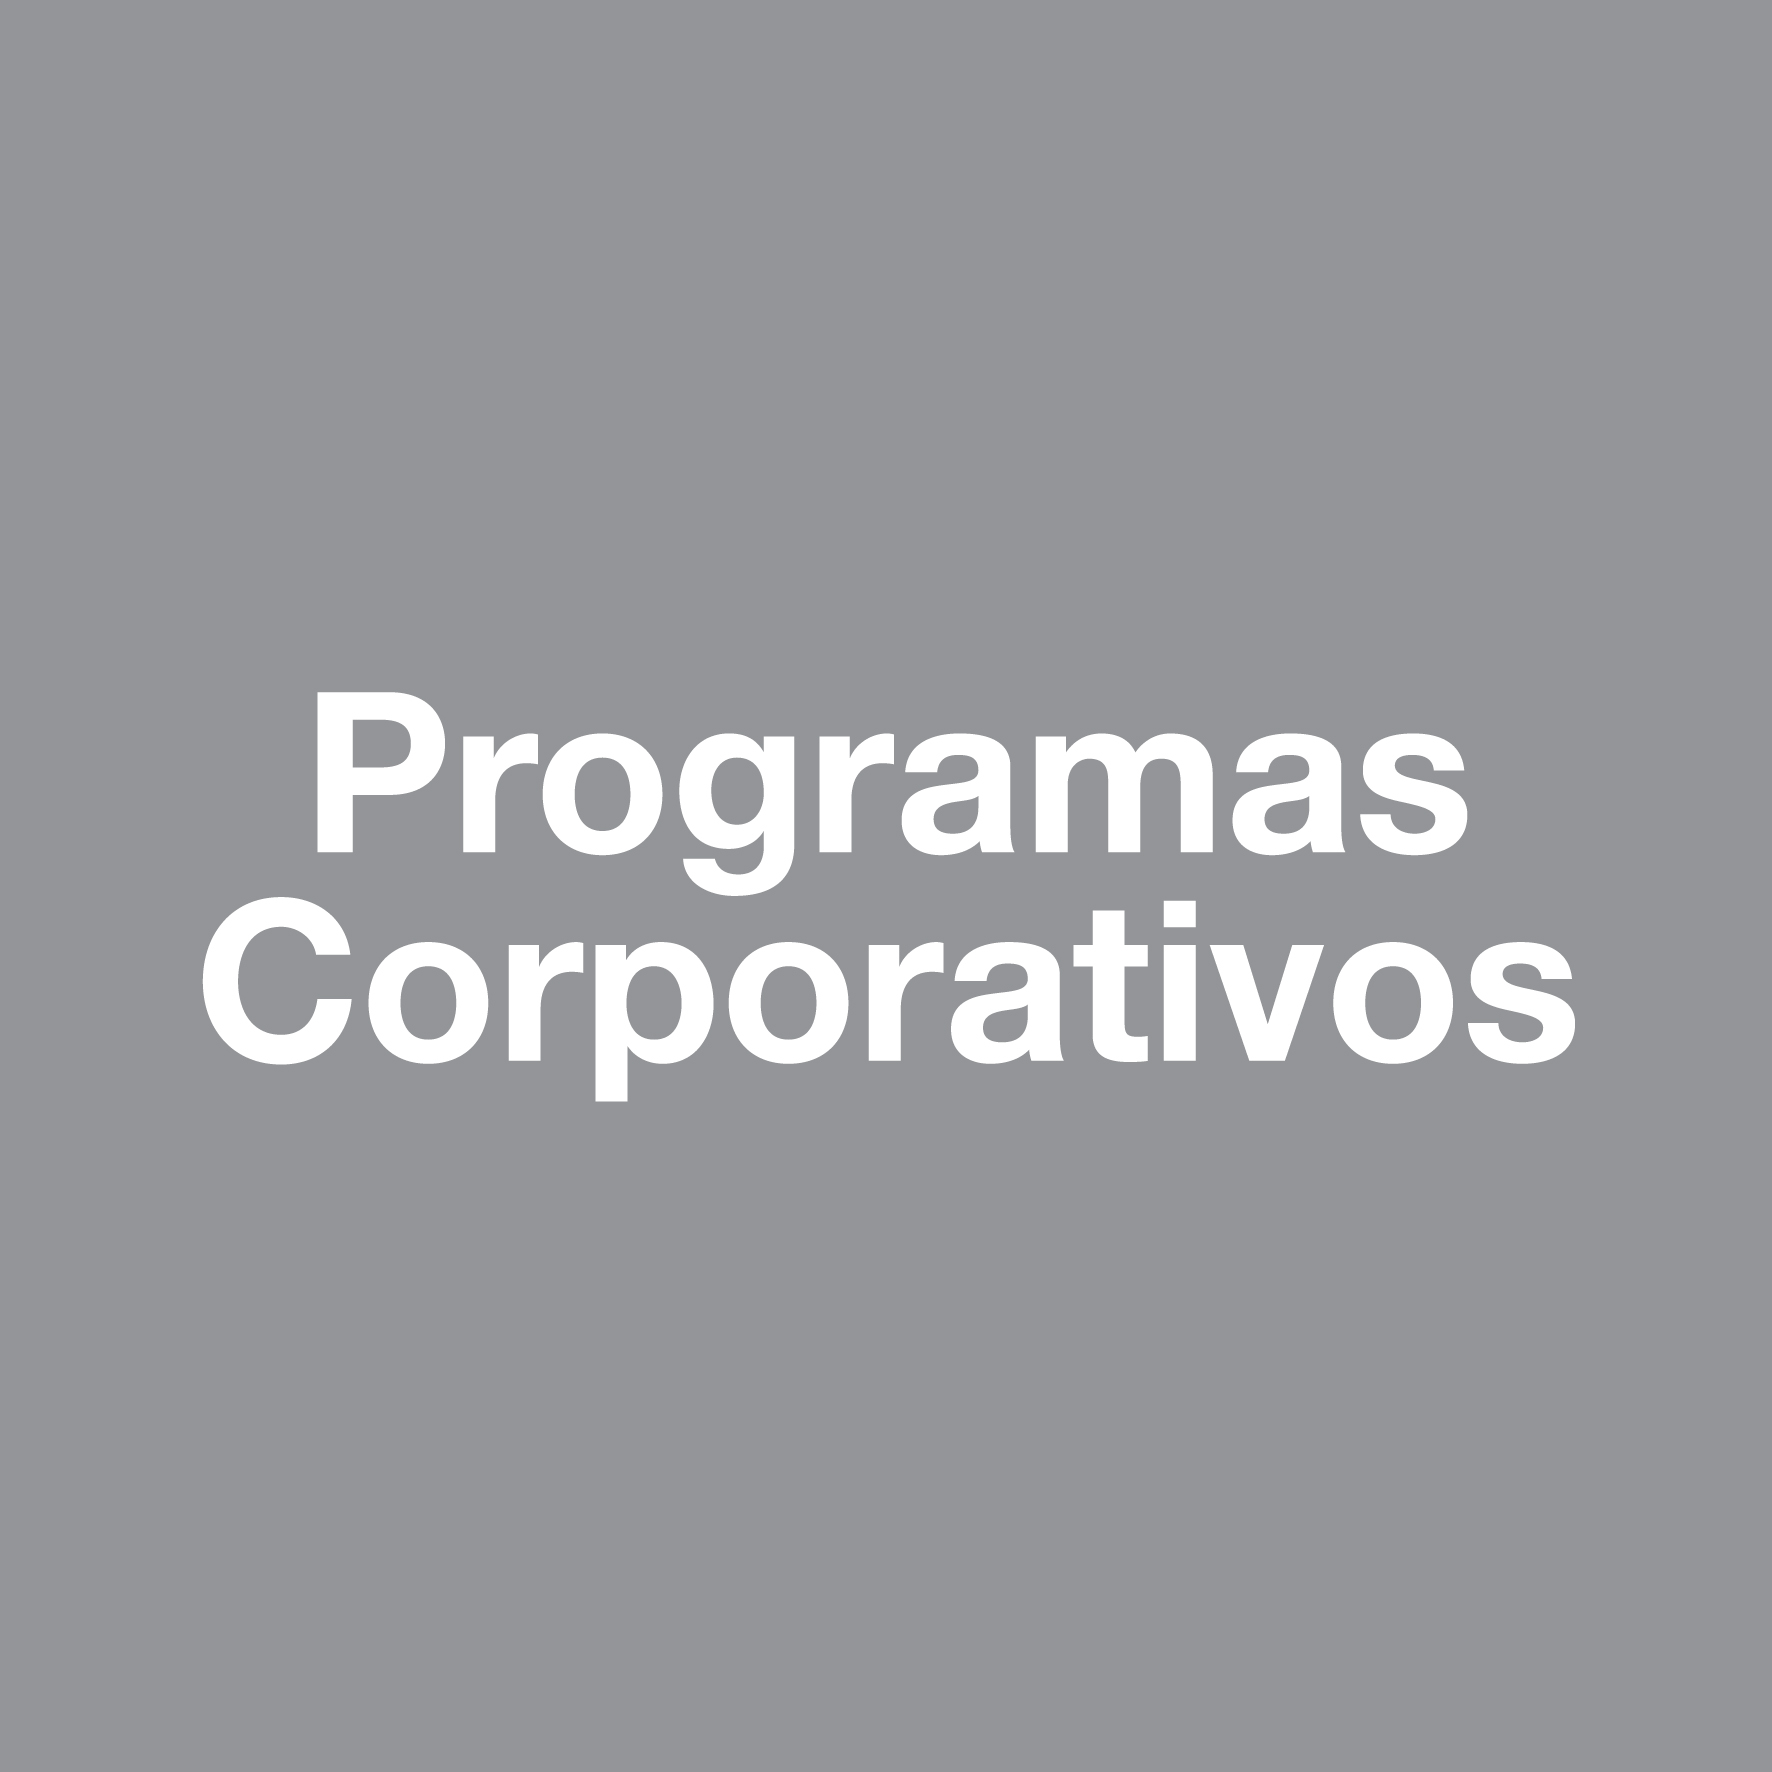 programas-corporativos